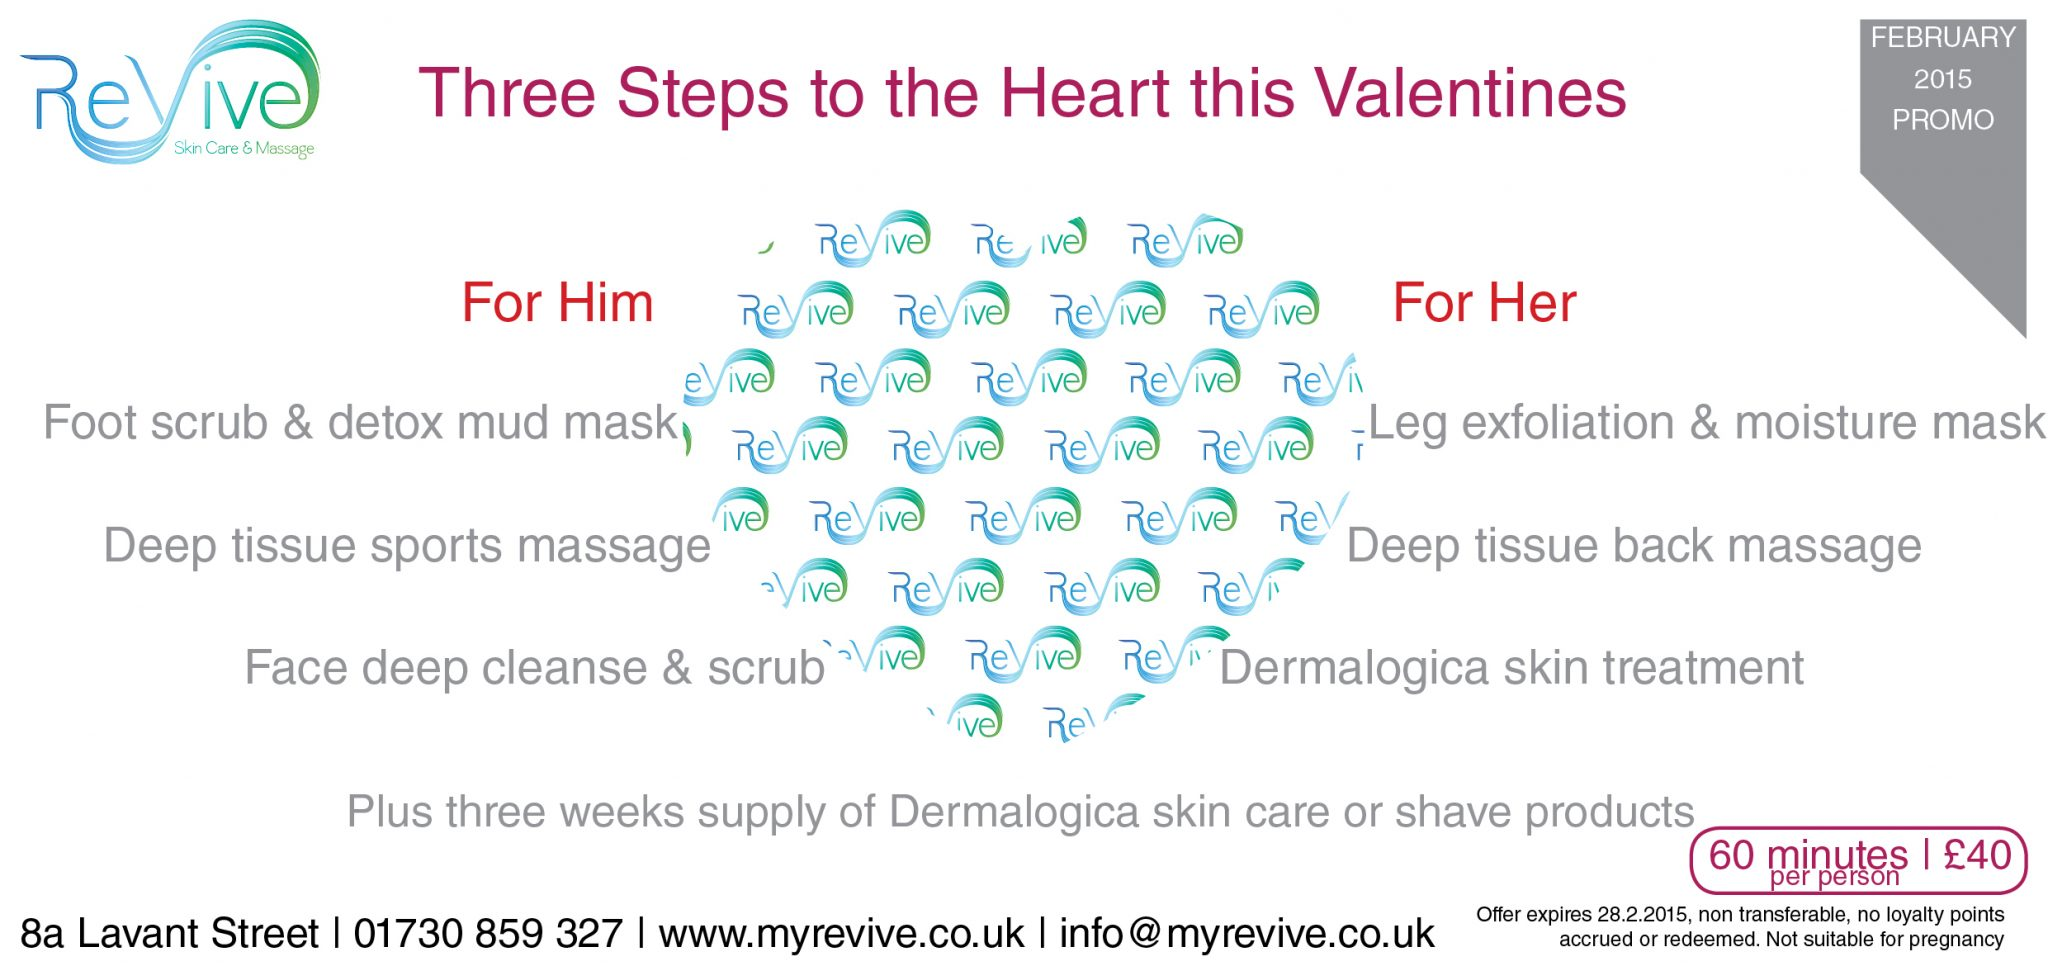 Feb S 2015 promo valentine